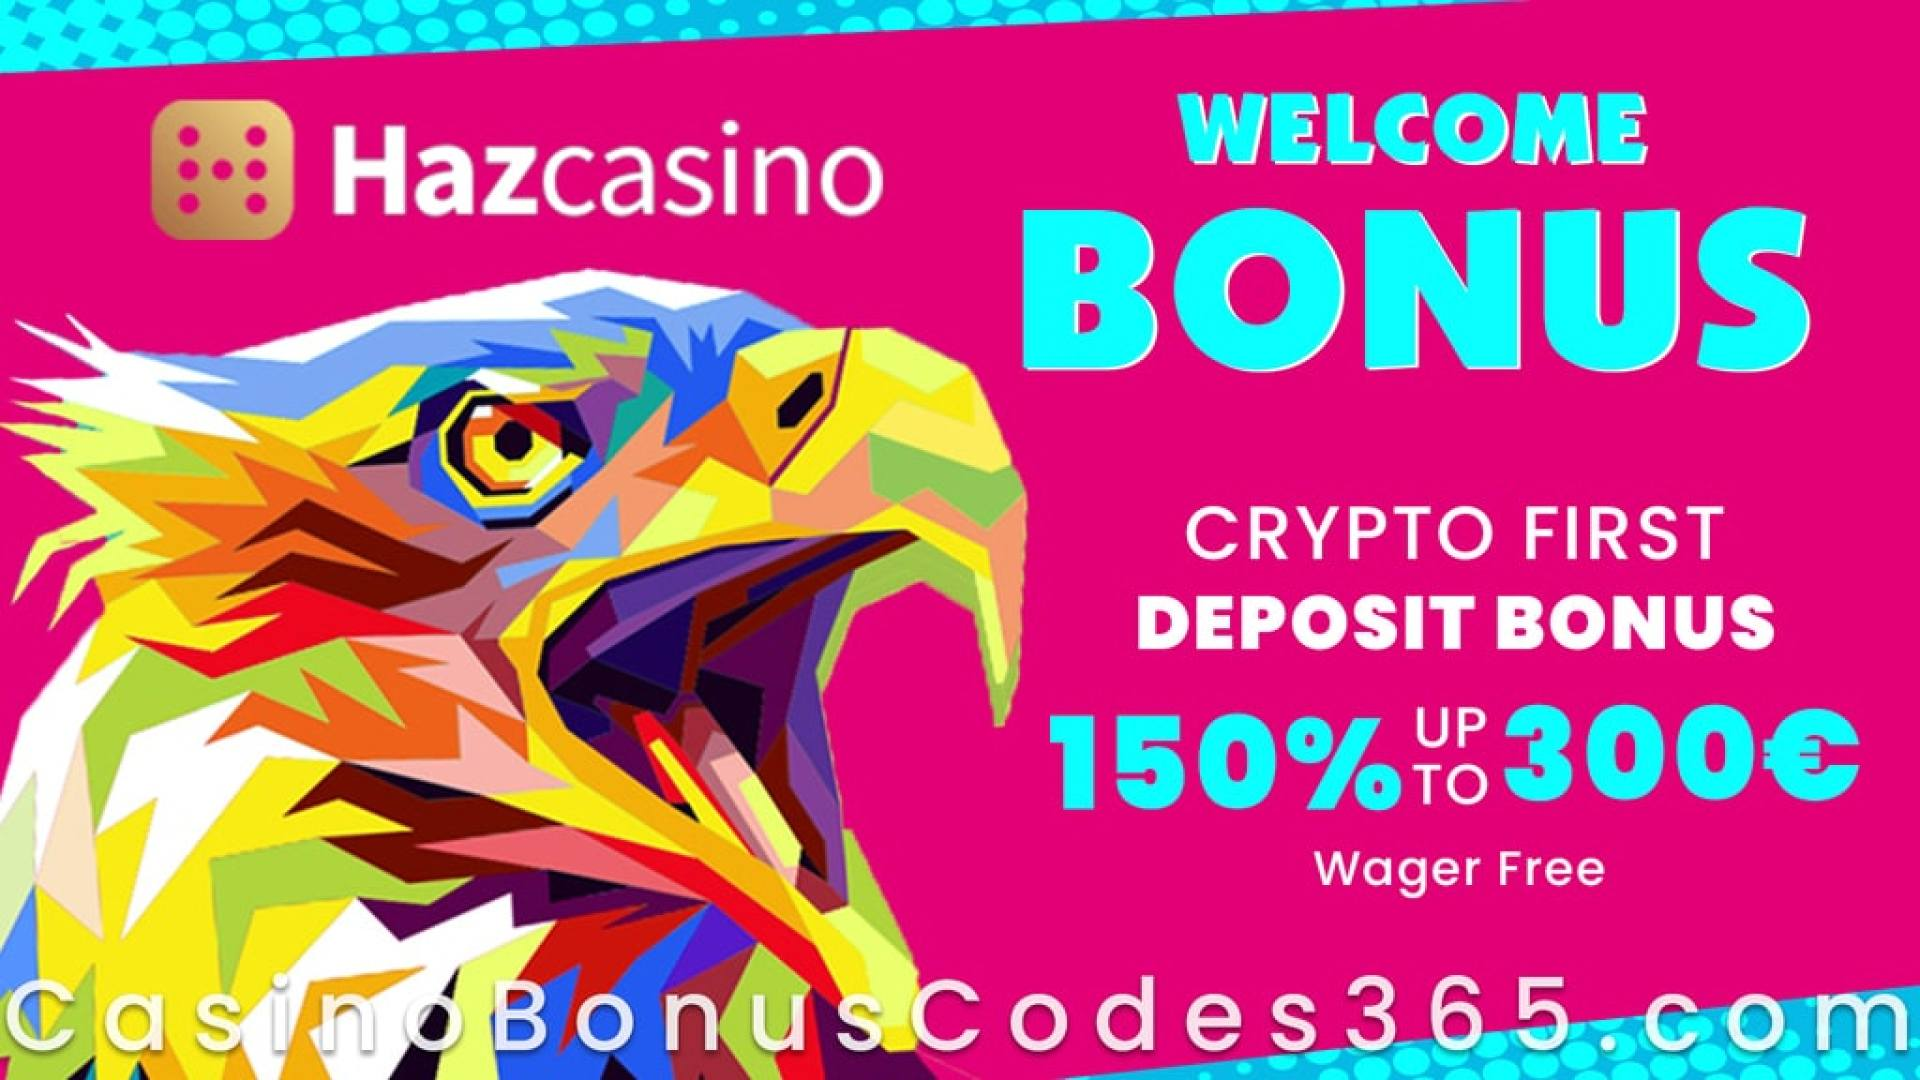 Haz Casino 150% Match up to €300 Crypto First Deposit Bonus